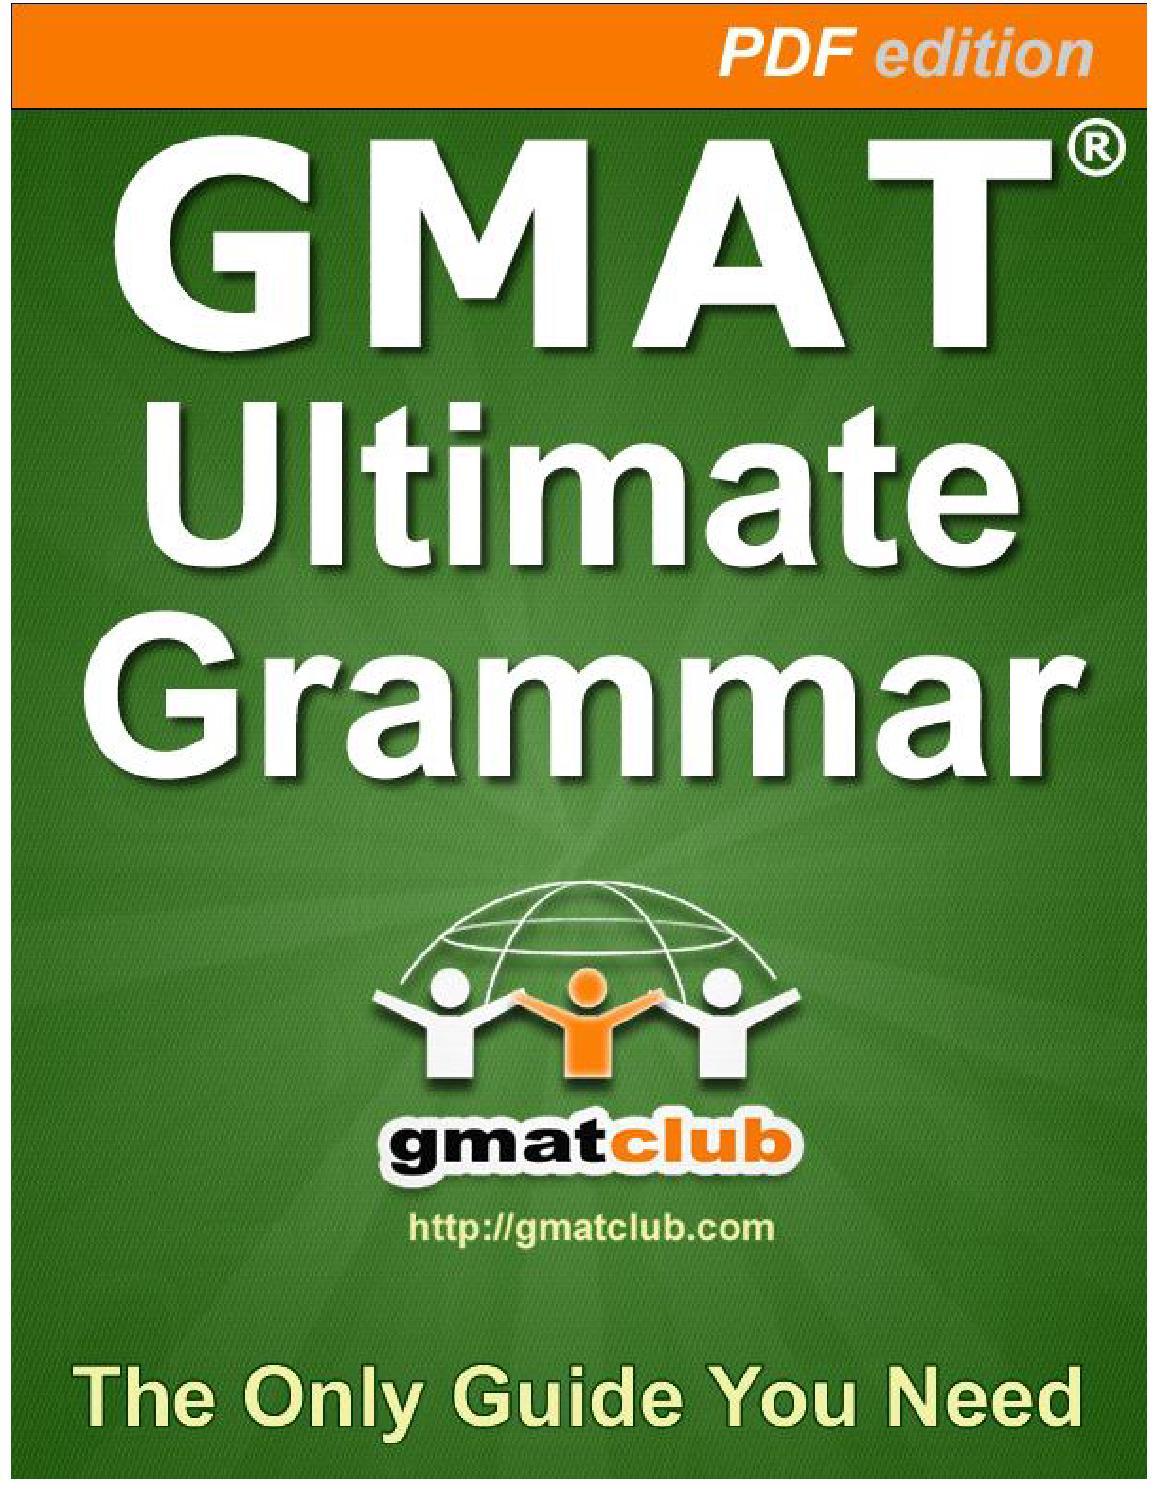 GMAT Advanced Grammer Flashcards By GMATClub by David Martin